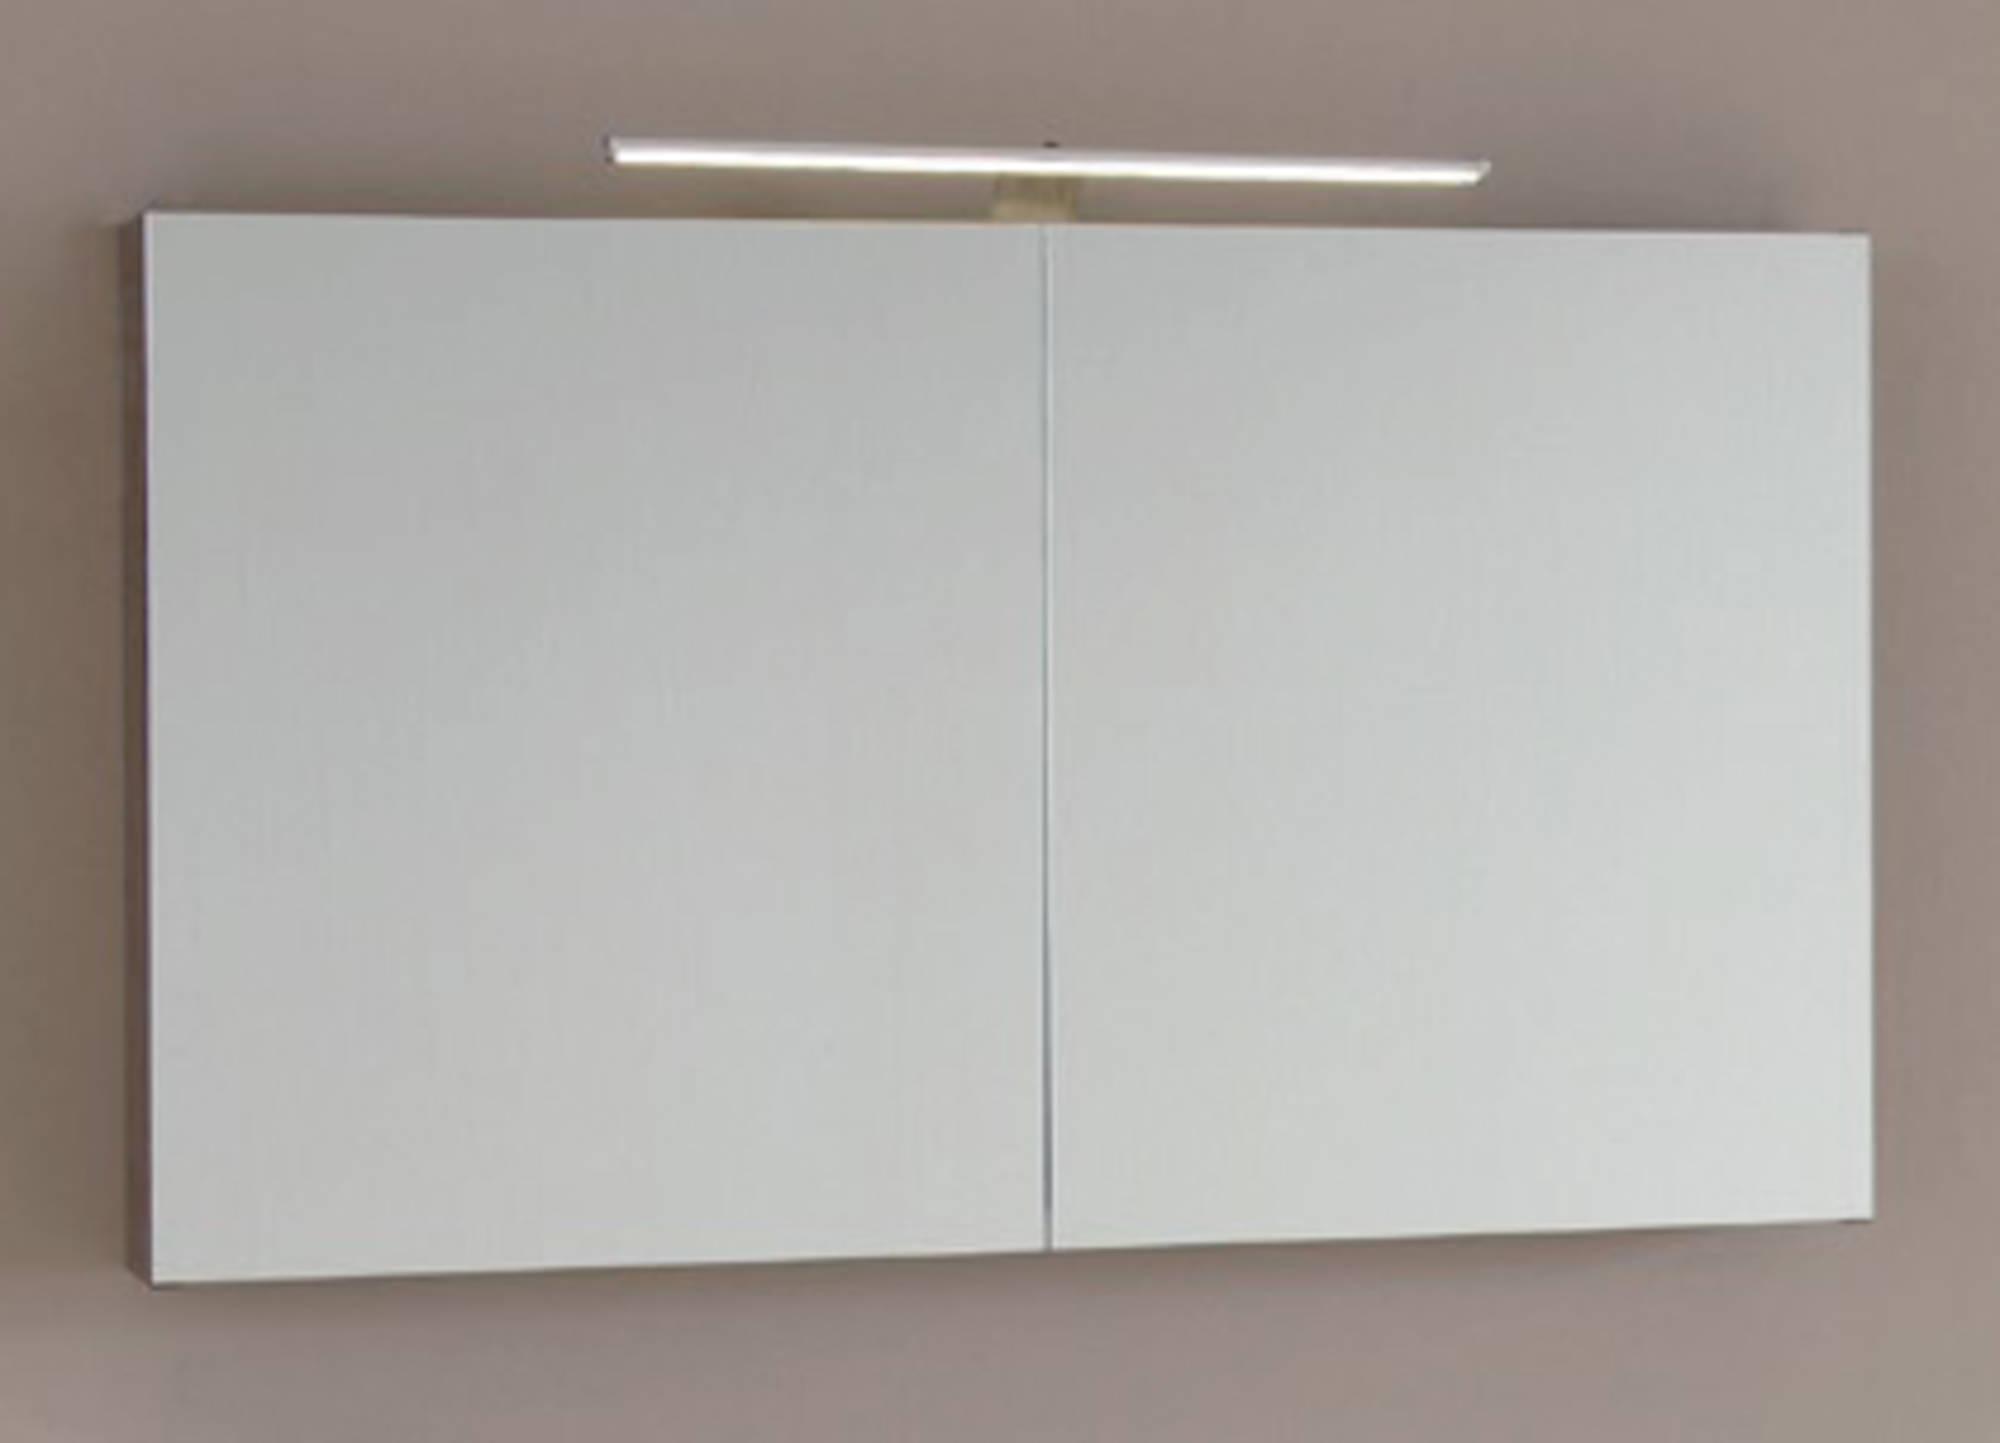 Line 45 Spiegelkast 100x13,5x60 cm excl. Verlichting Hoogglans Wit